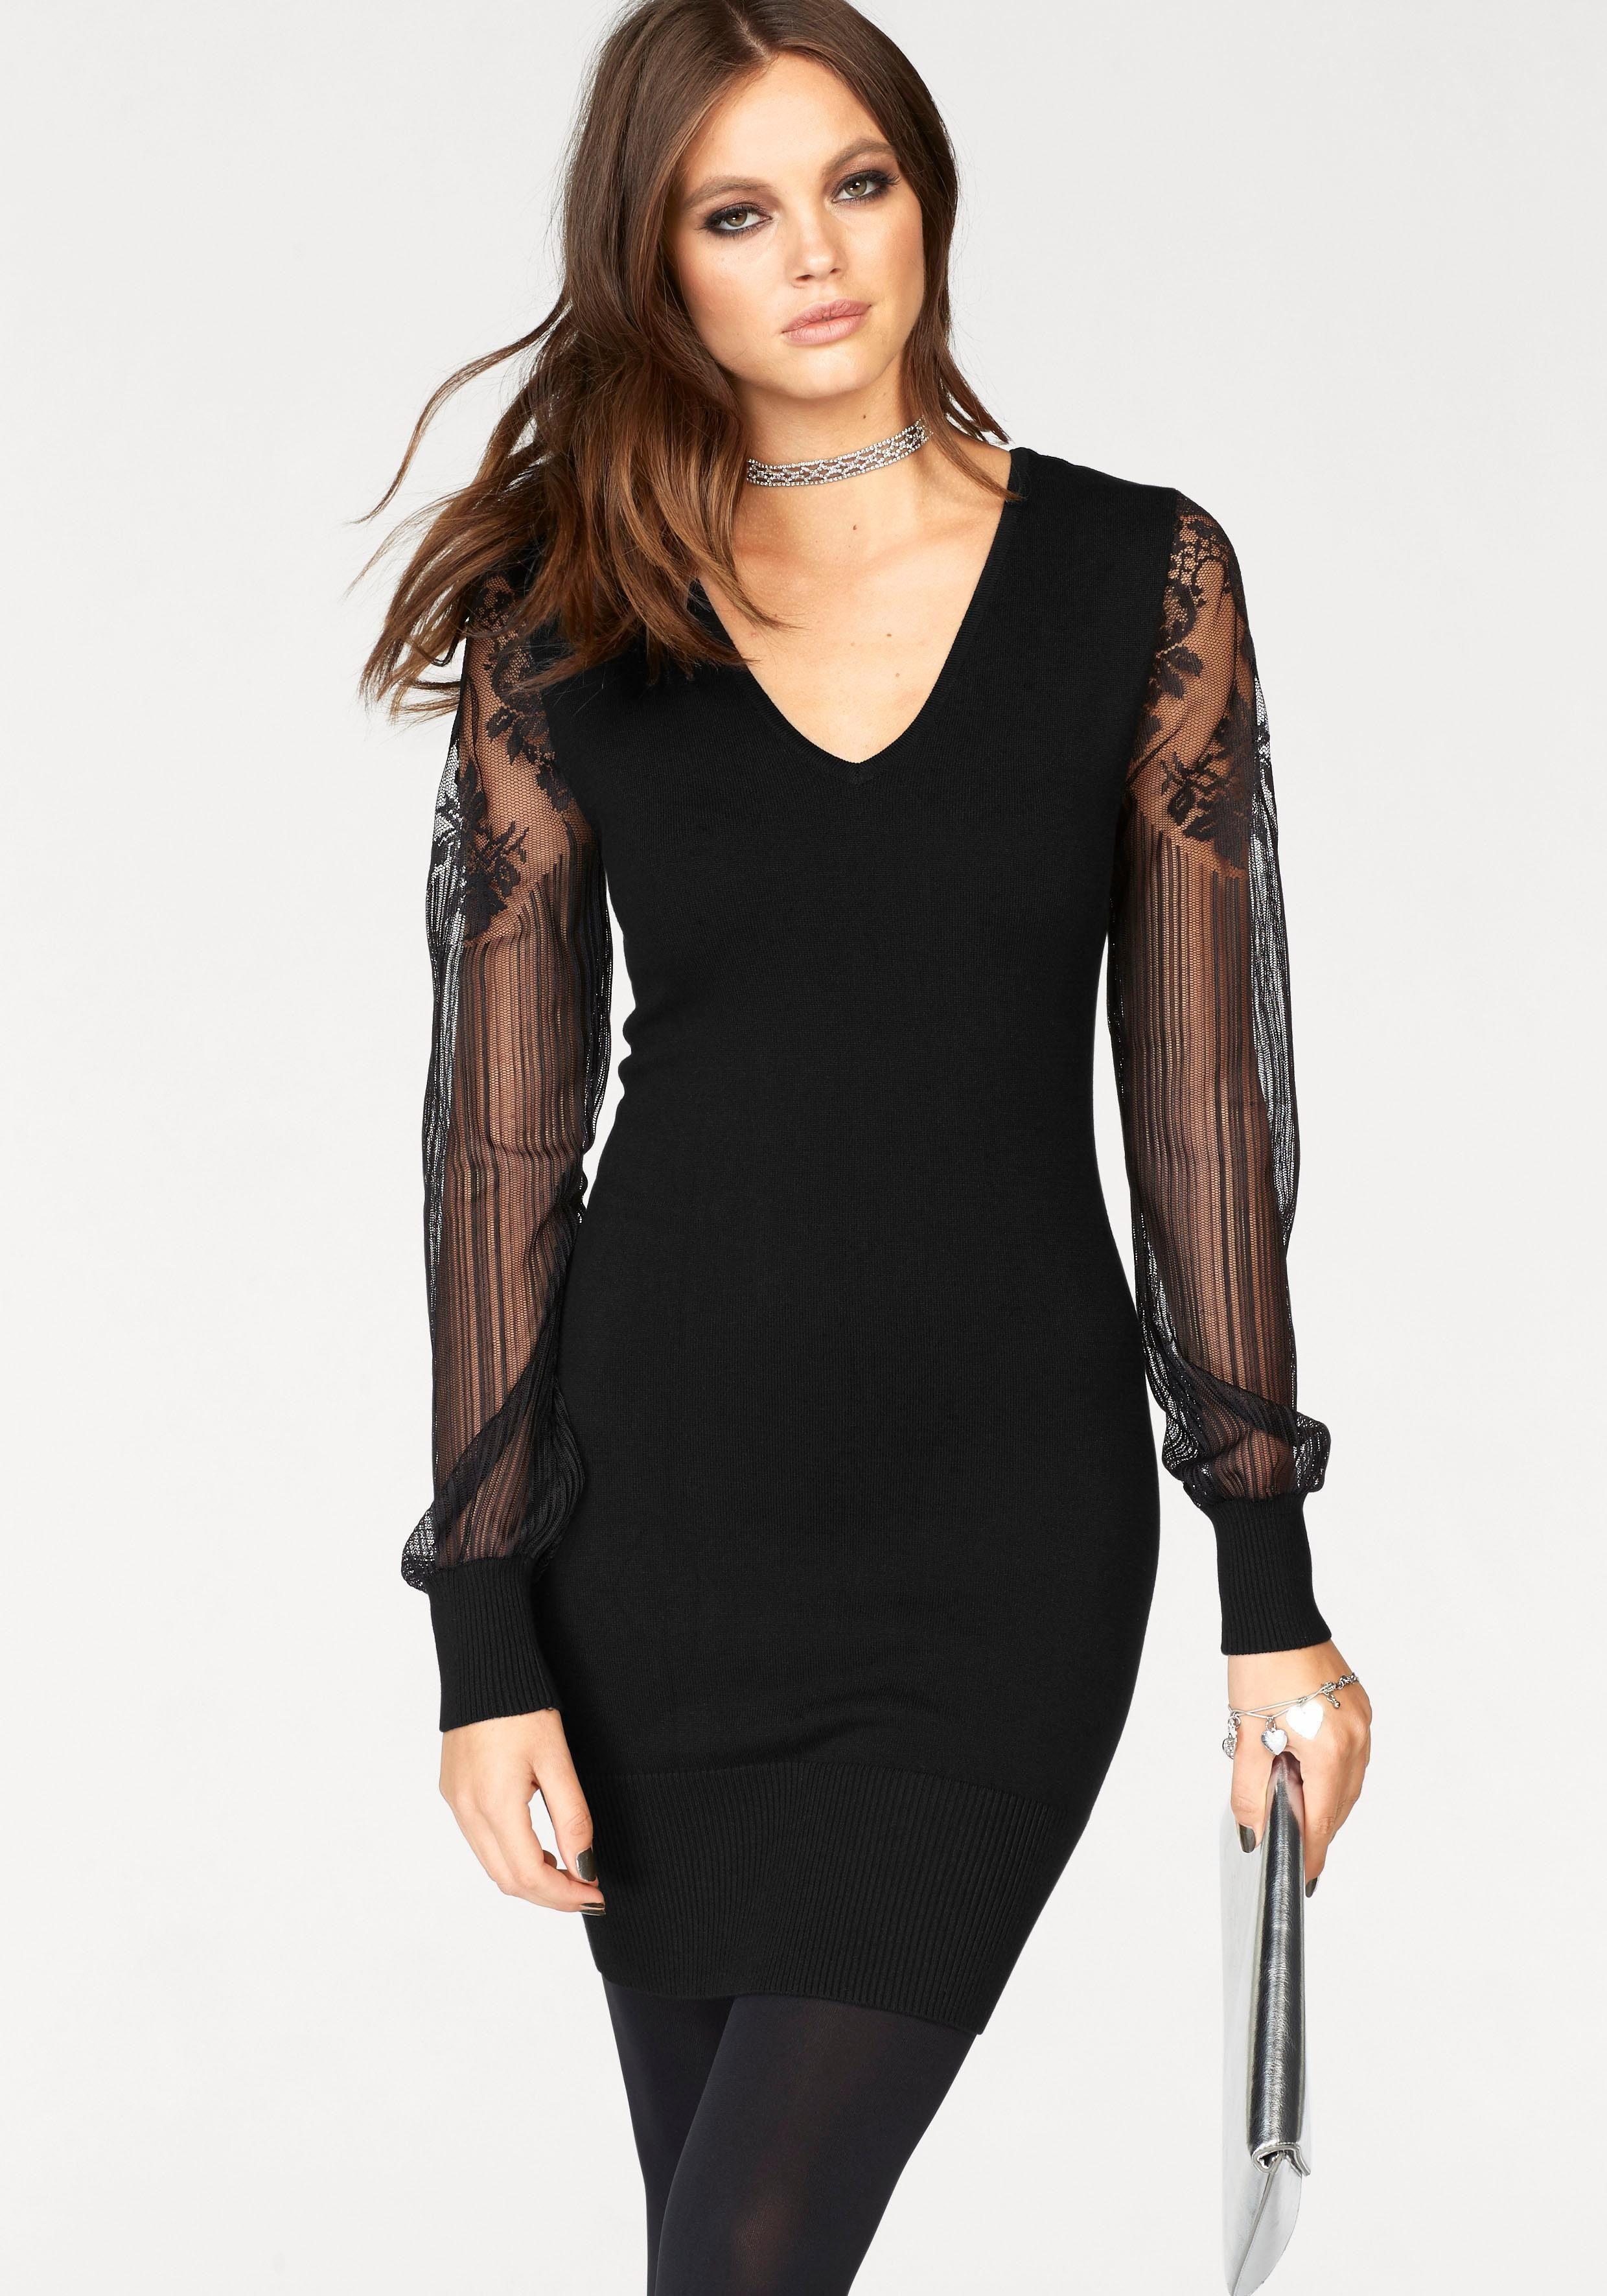 Gebreide jurk online kopen? Shop je jurk hier | OTTO